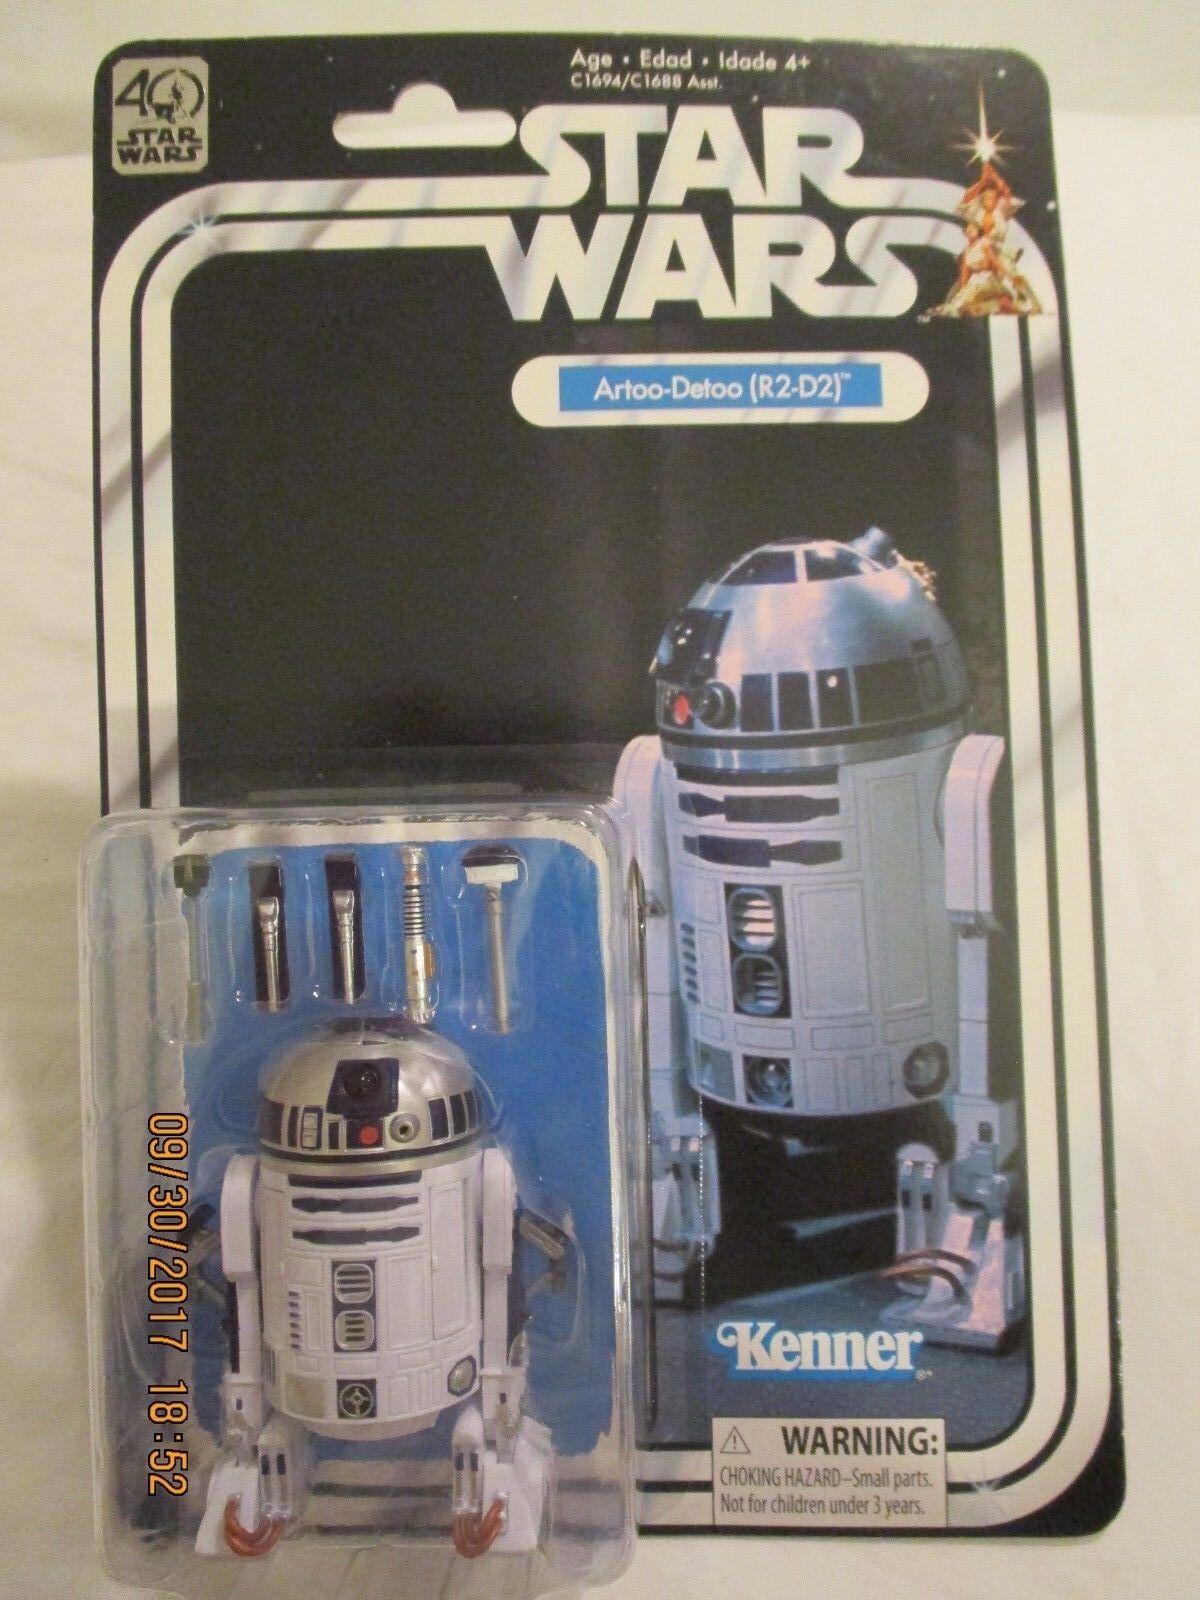 Star Wars 40th Anniversary Artoo-Detoo R2-D2 3 1 4  Figure by Kenner